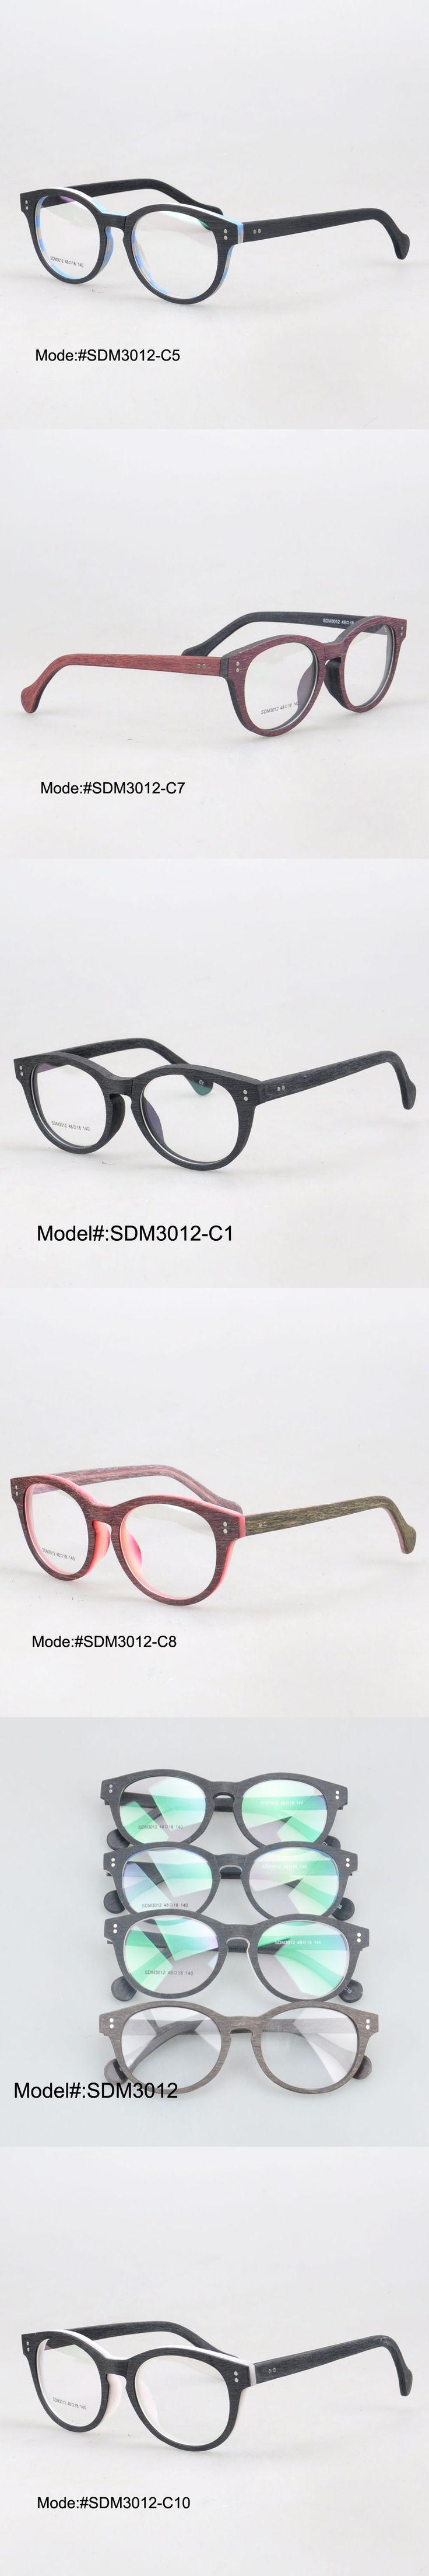 MY DOLI SDM3012 new arrival full rim fashionable acetate imitating wood glasses myopia spectacles optical frames eyewear